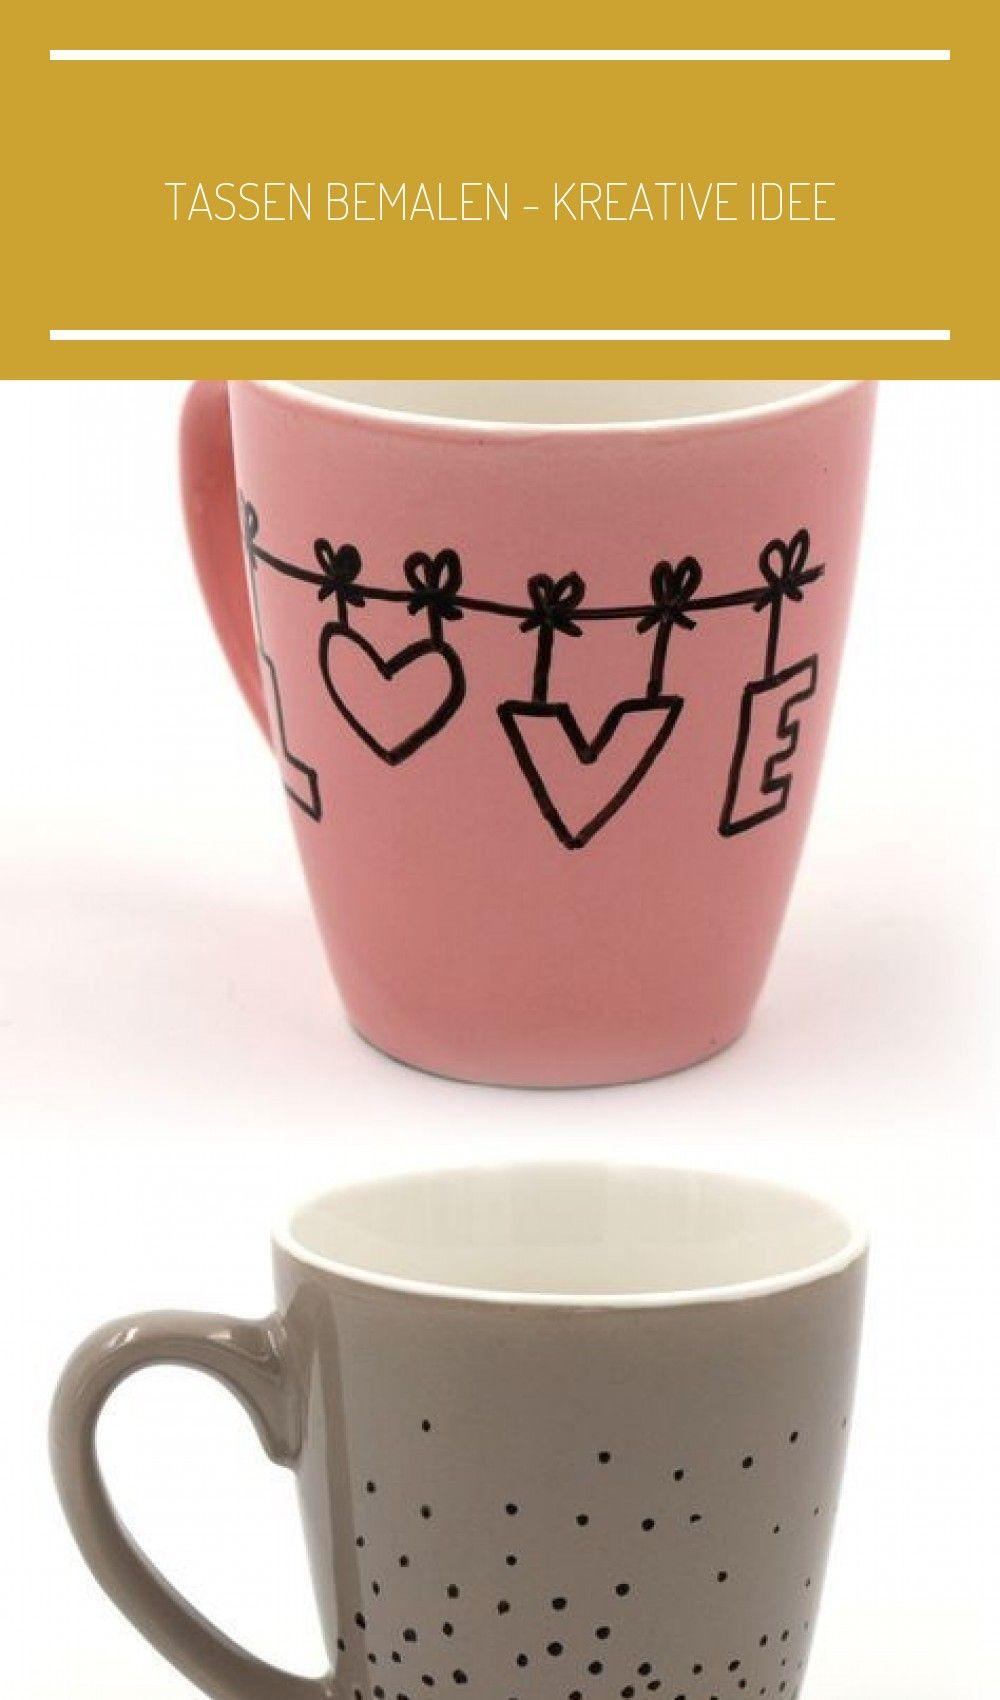 Tassen Bemalen Kreative Idee Tableware Mugs